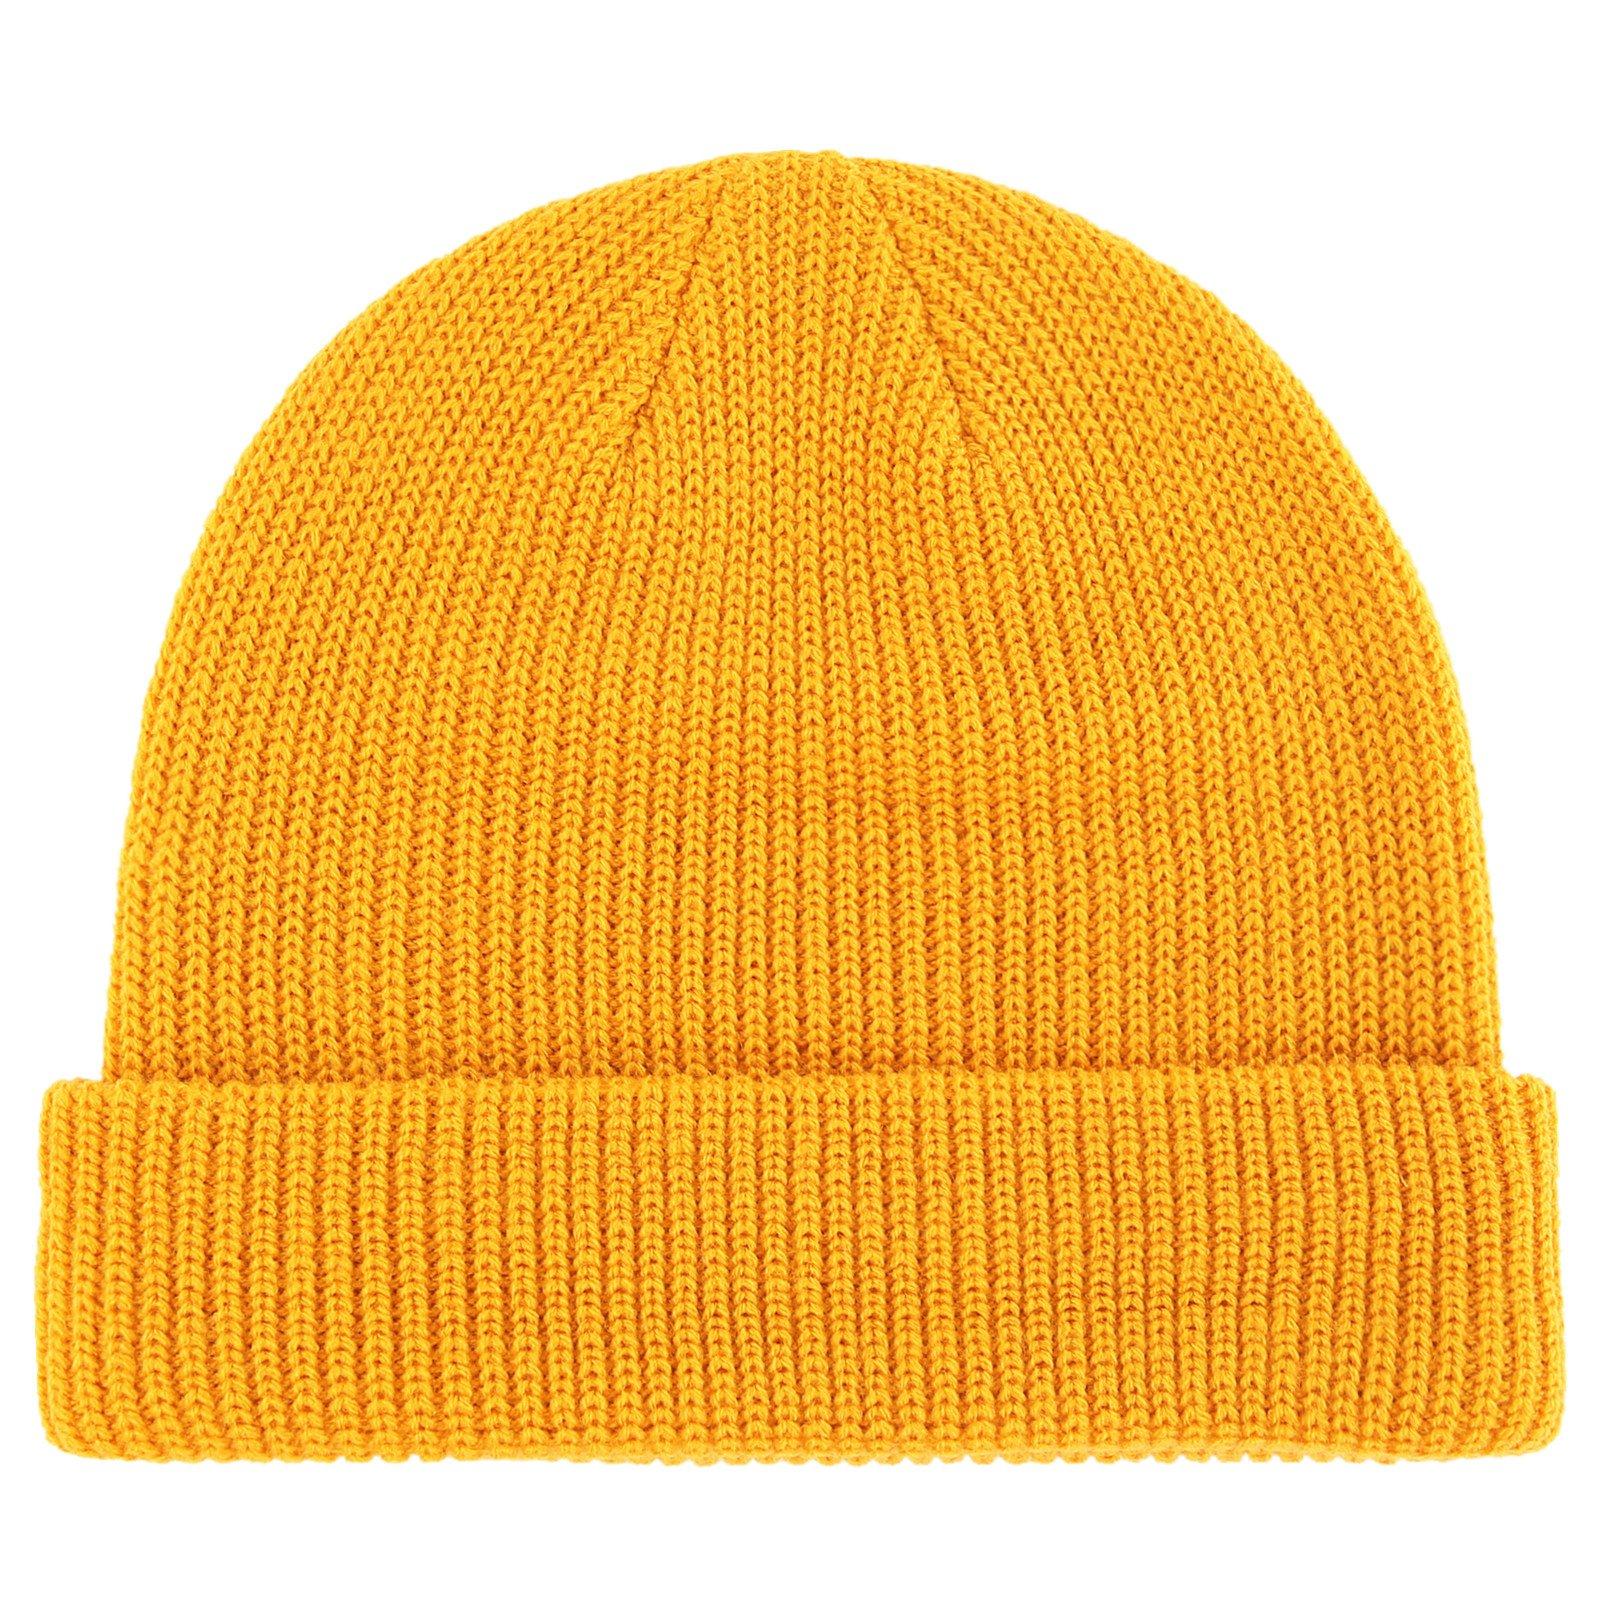 de1fa259 Connectyle Classic Men's Warm Winter Hats Acrylic Knit Cuff Beanie Cap  Daily Beanie Hat (Mustard Yellow)